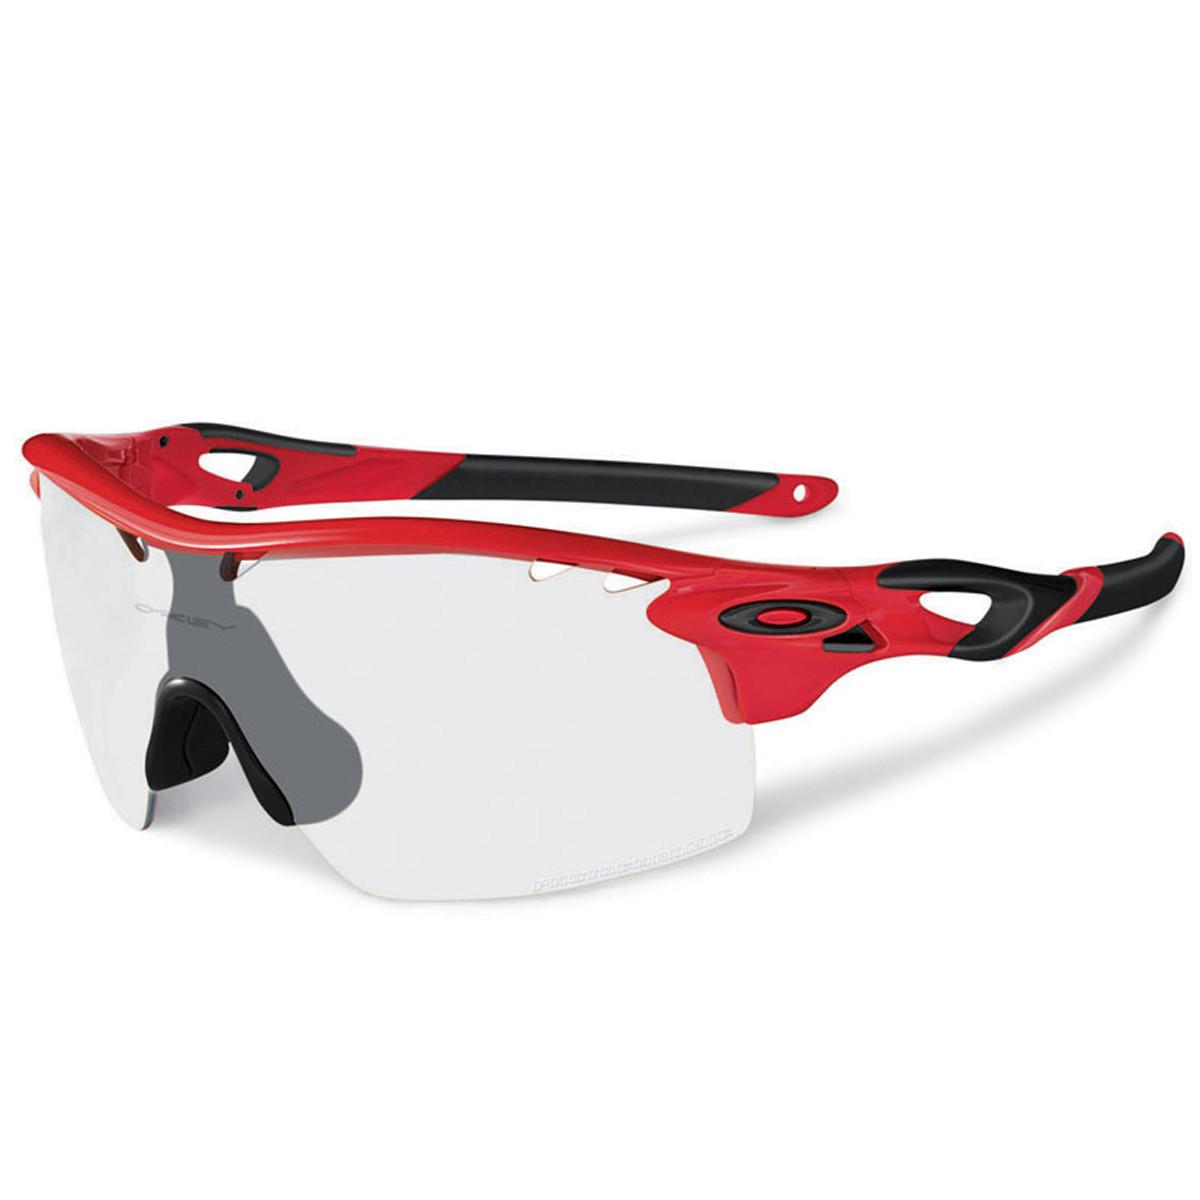 06a8c3e683667 Óculos Oakley RadarLock Infrared Lente Clear to Black Iridium ref ...